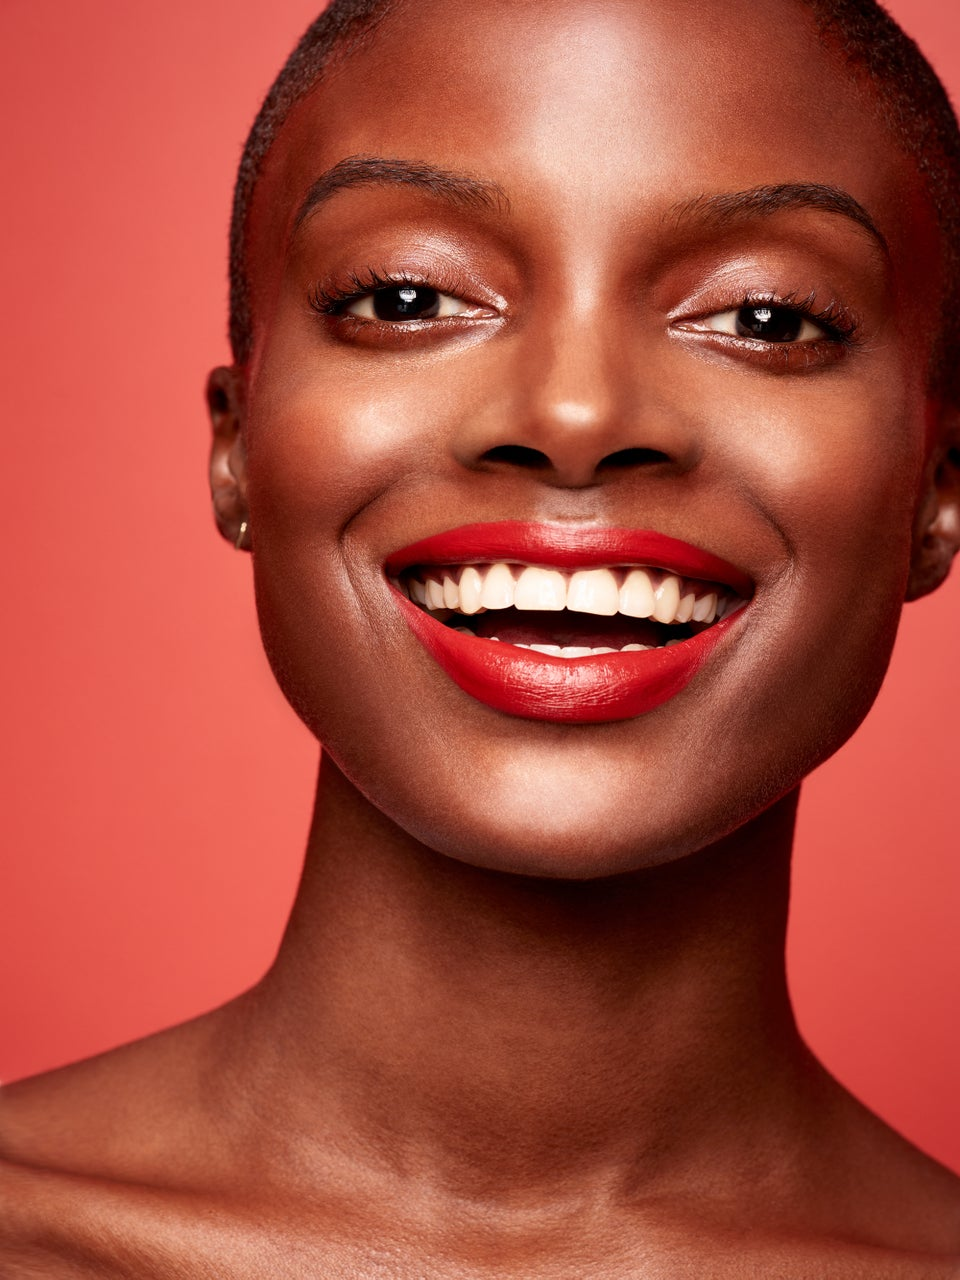 This Badass Red Lipstick Donates 100% Net Profits To The ACLU